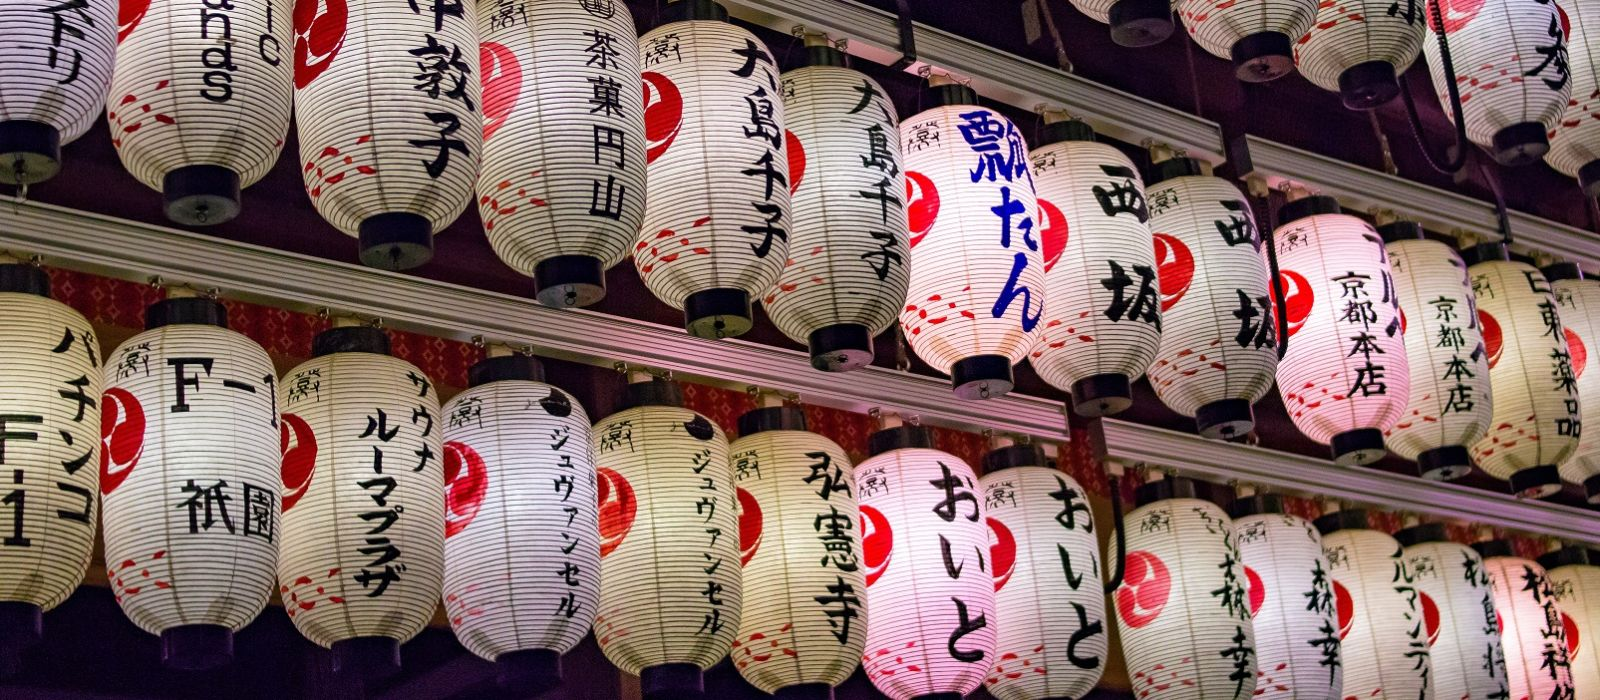 Kultur & Geschichte Japans Urlaub 4